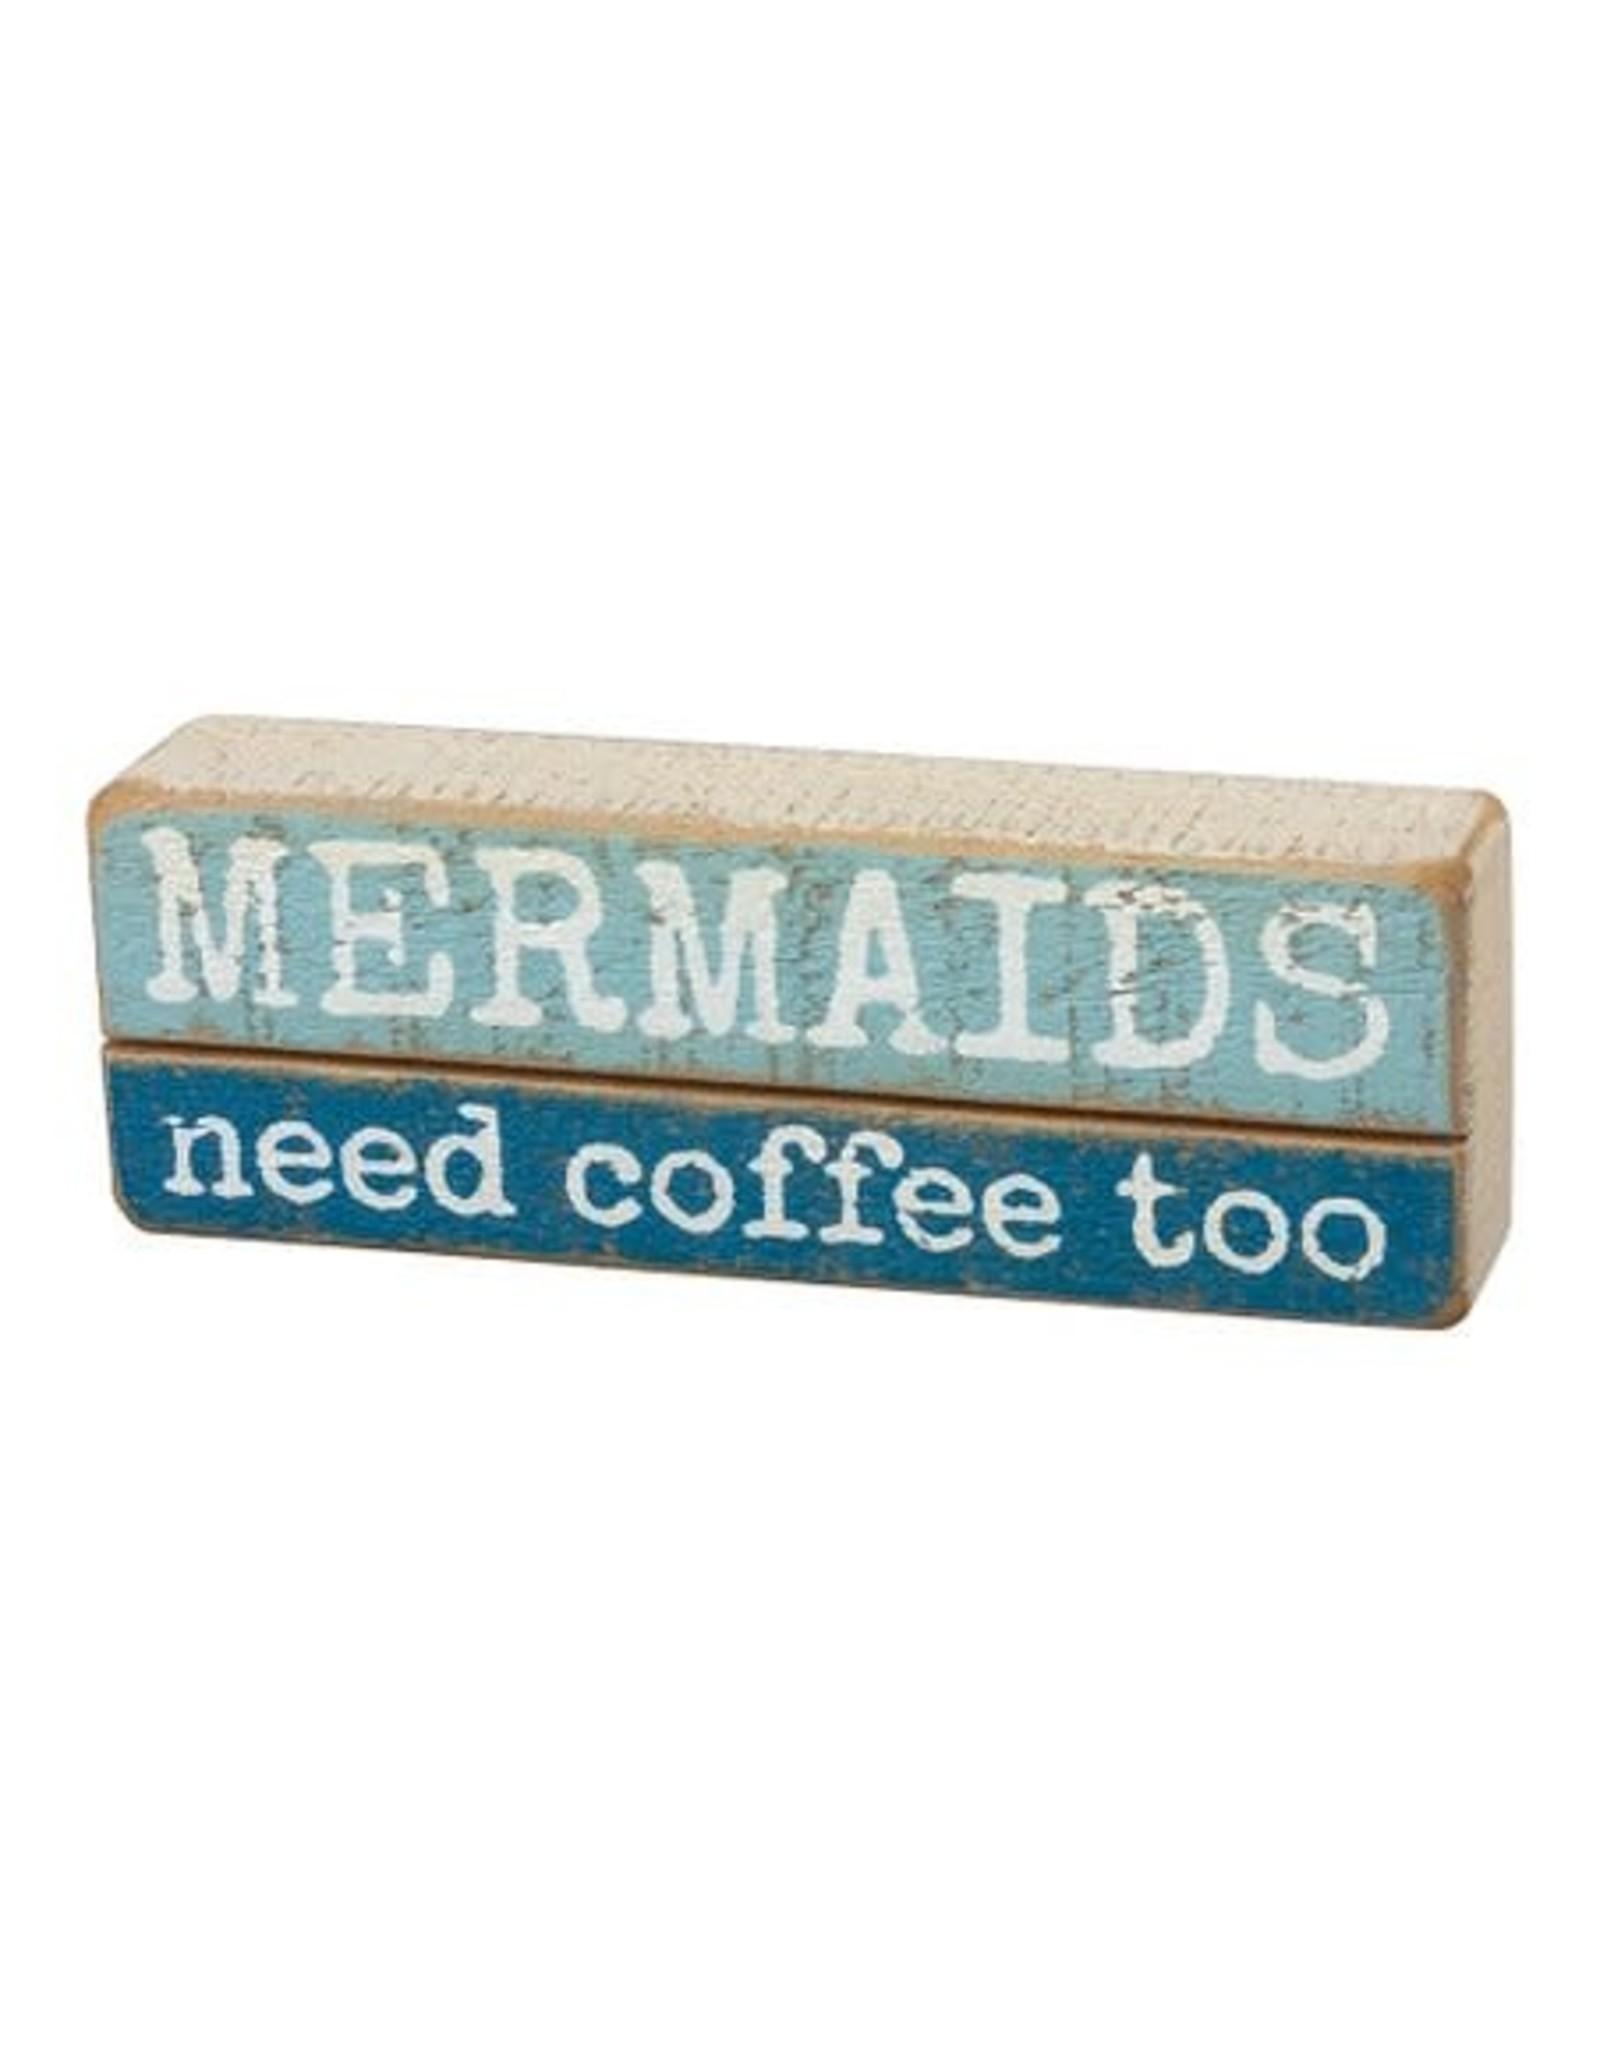 PRIMITIVES BY KATHY BEACH LOVER BLOCK SIGNS MERMAIDS NEED COFFEE TOO